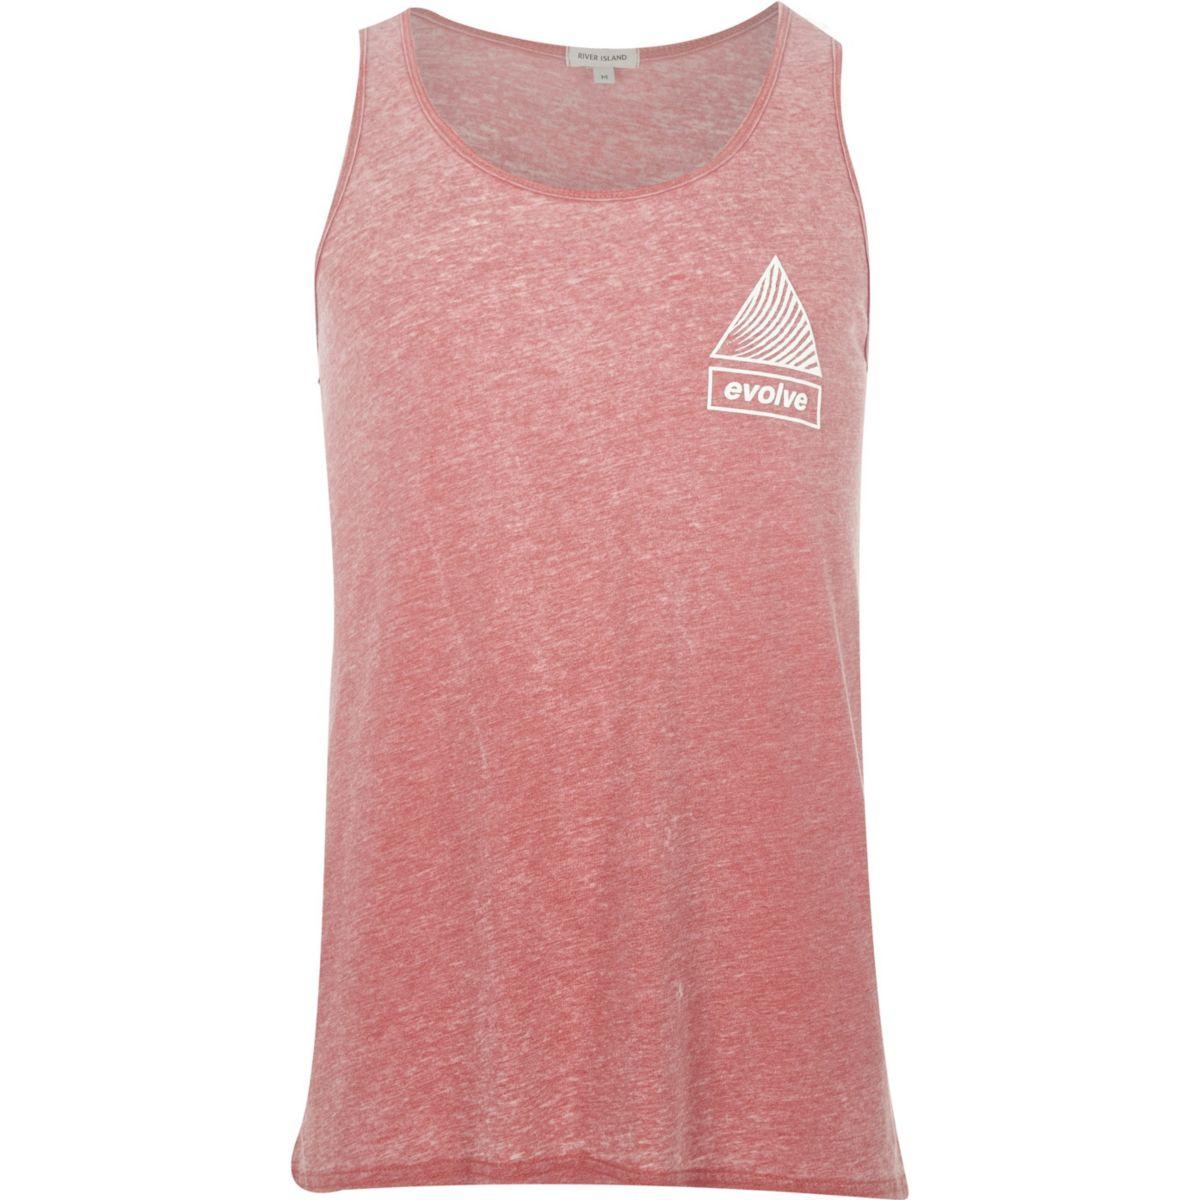 Orange burnout 'evolve' print vest